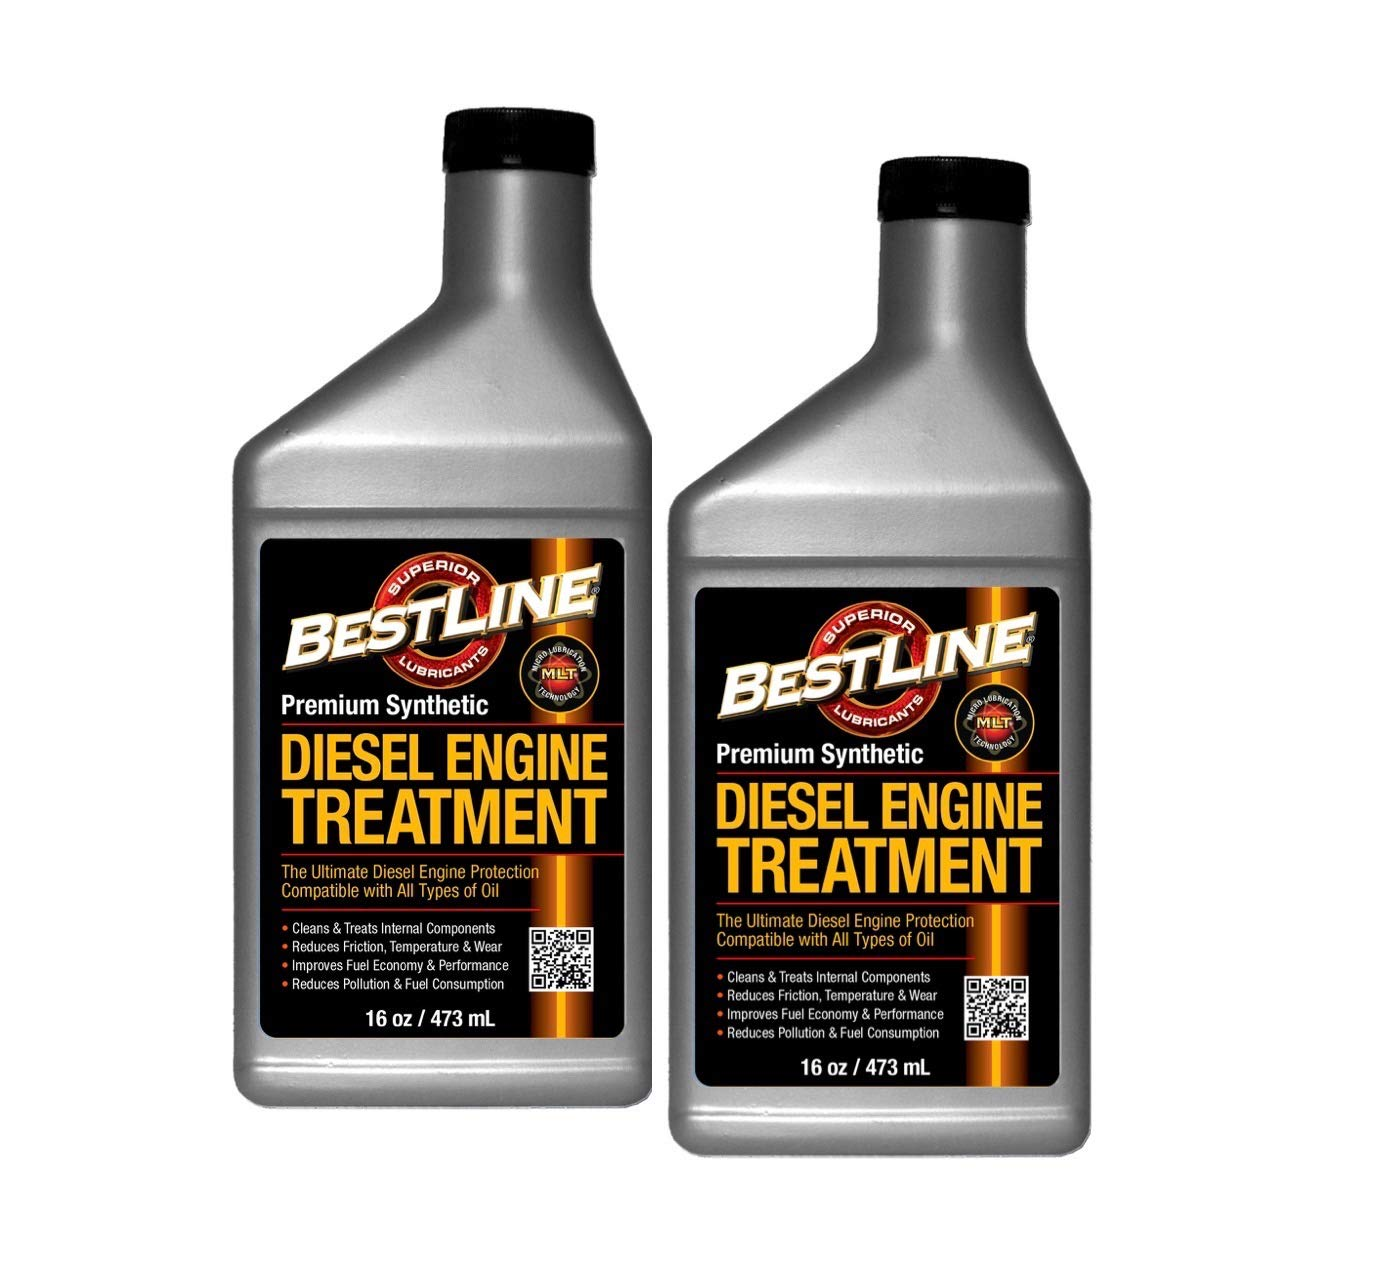 BestLine Diesel Engine Treatment 2 Pack BestLine Superior Lubricants